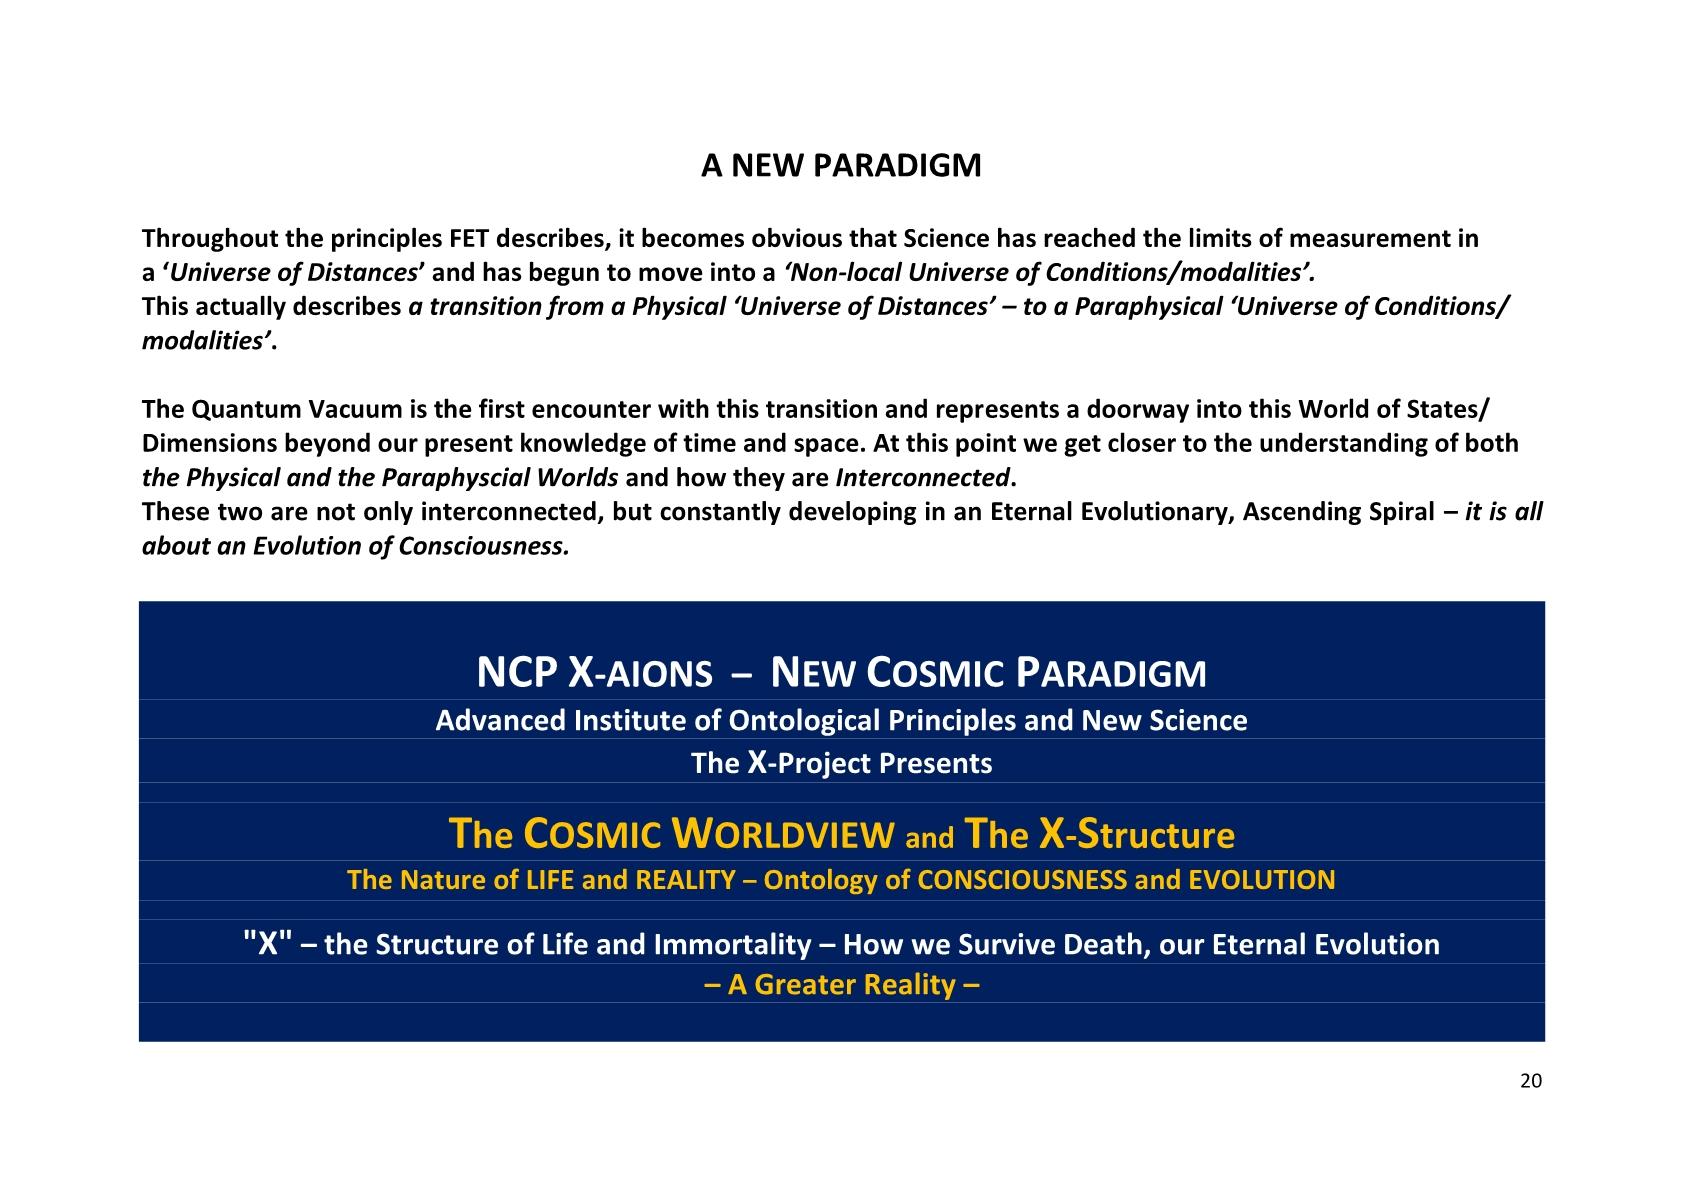 TSC 2012 A New Paradigm, NCP X-AIONS